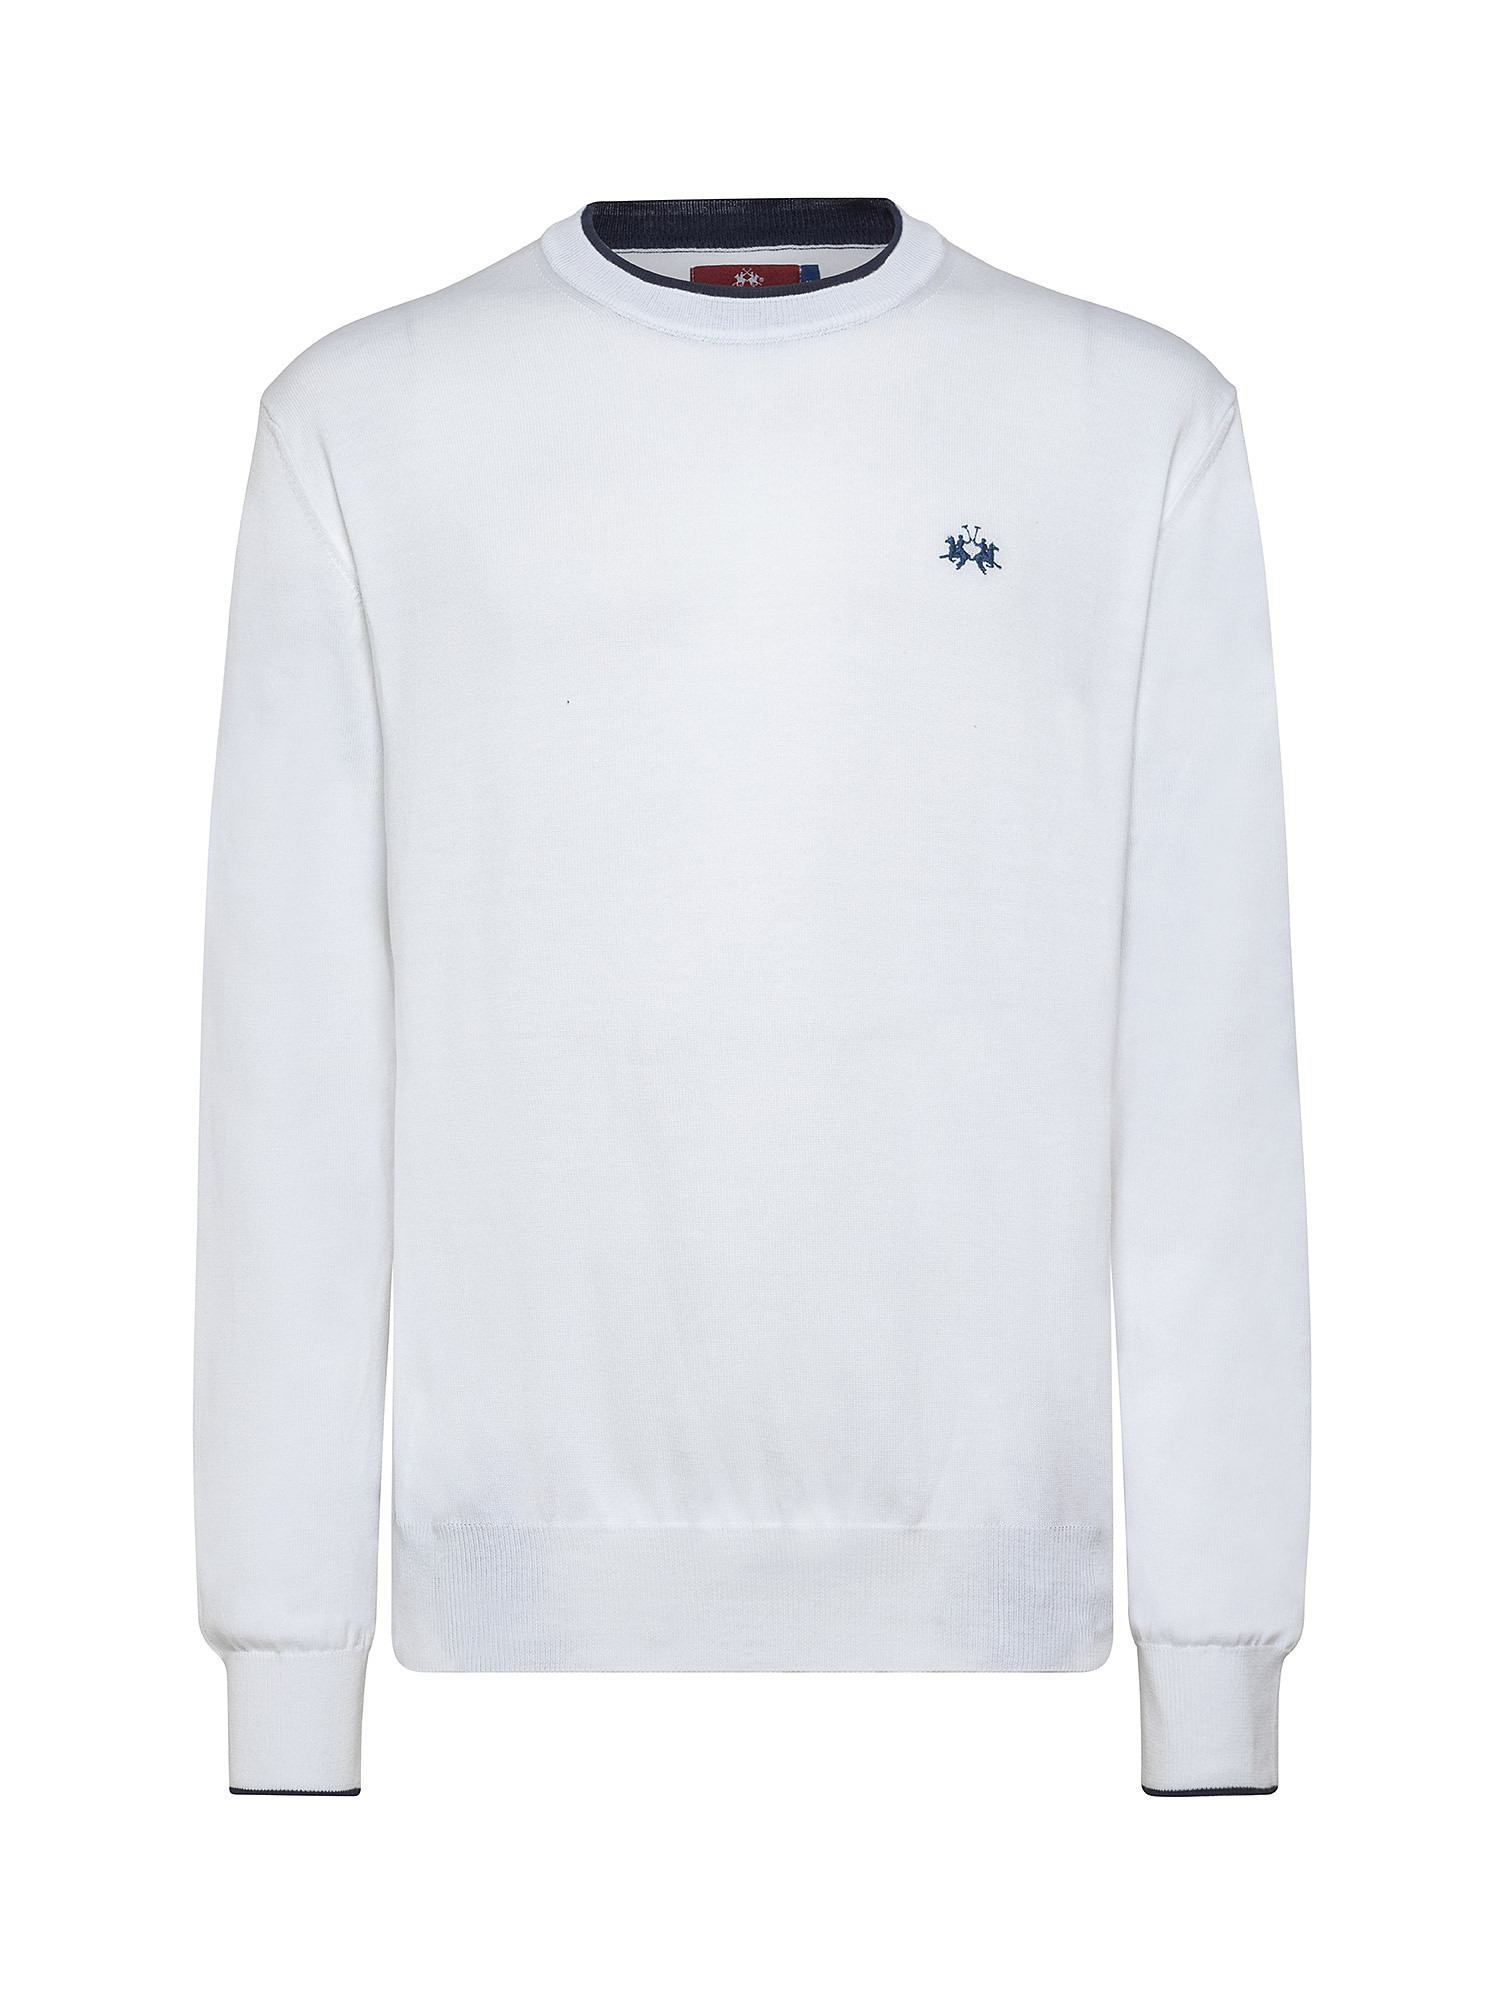 Felpa da uomo in cotone regular fit, Bianco, large image number 0